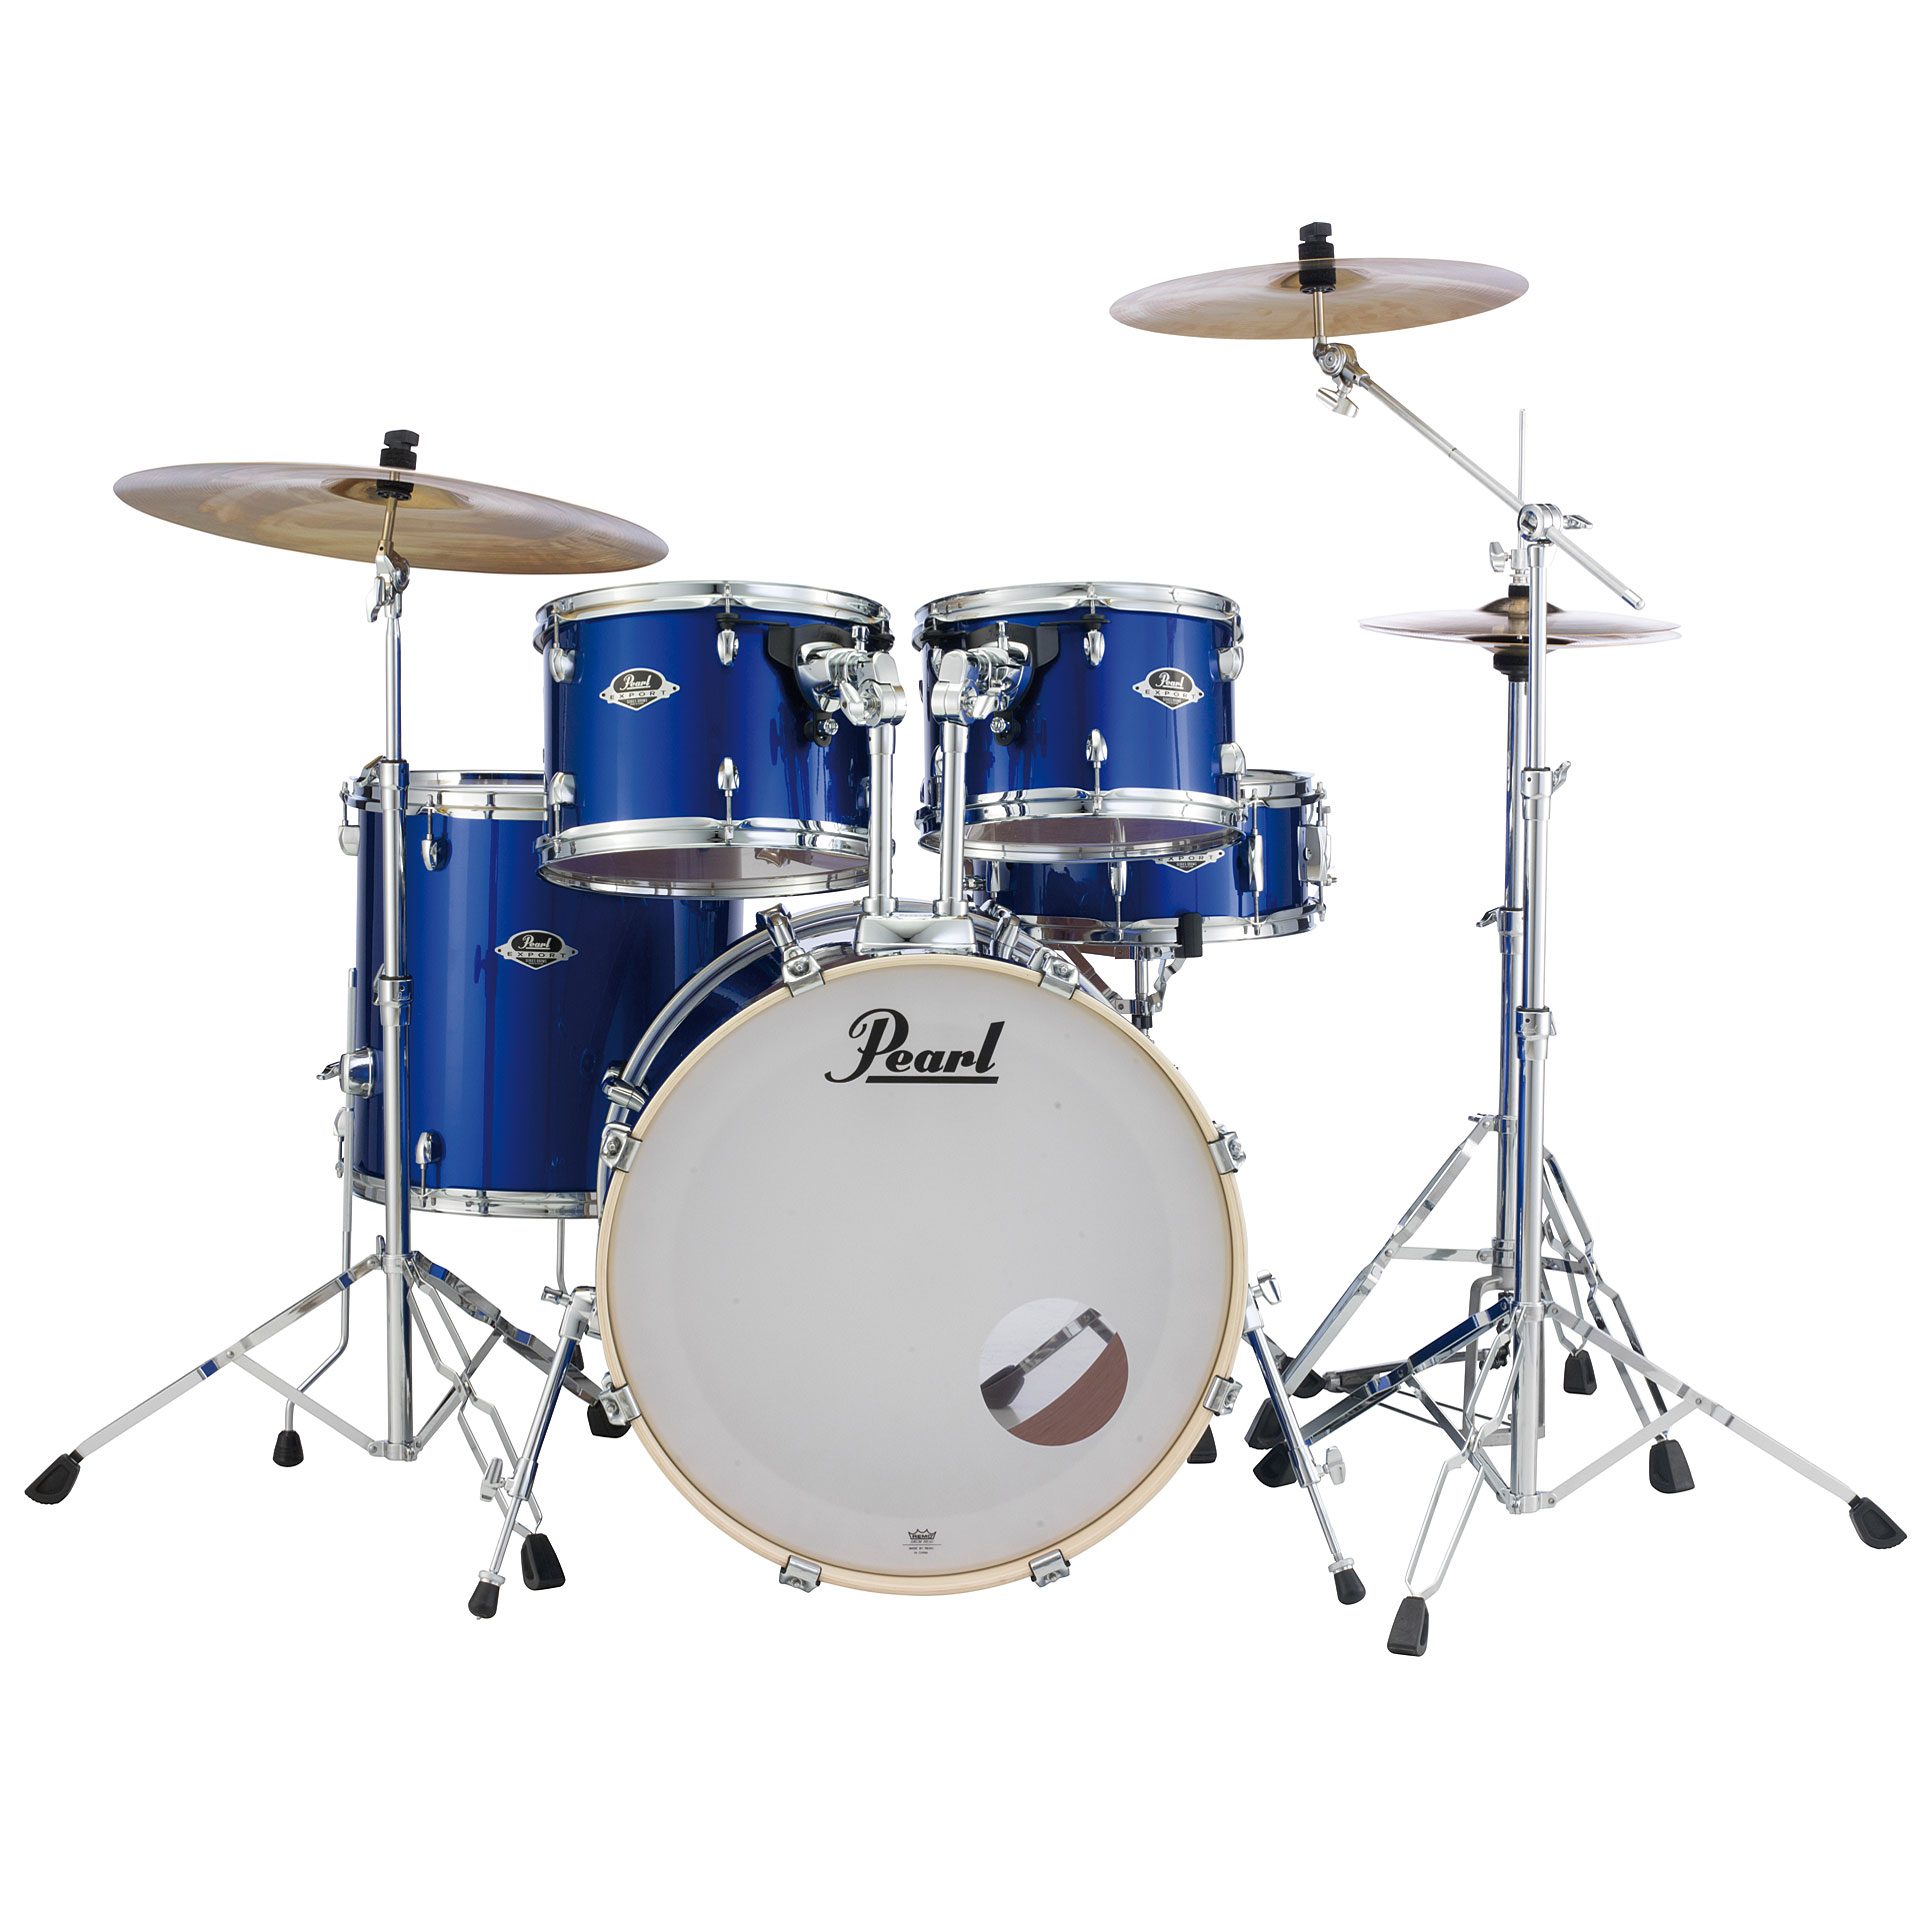 Schlagzeug Pearl Export 22 High Voltage Blue Complete Drumset